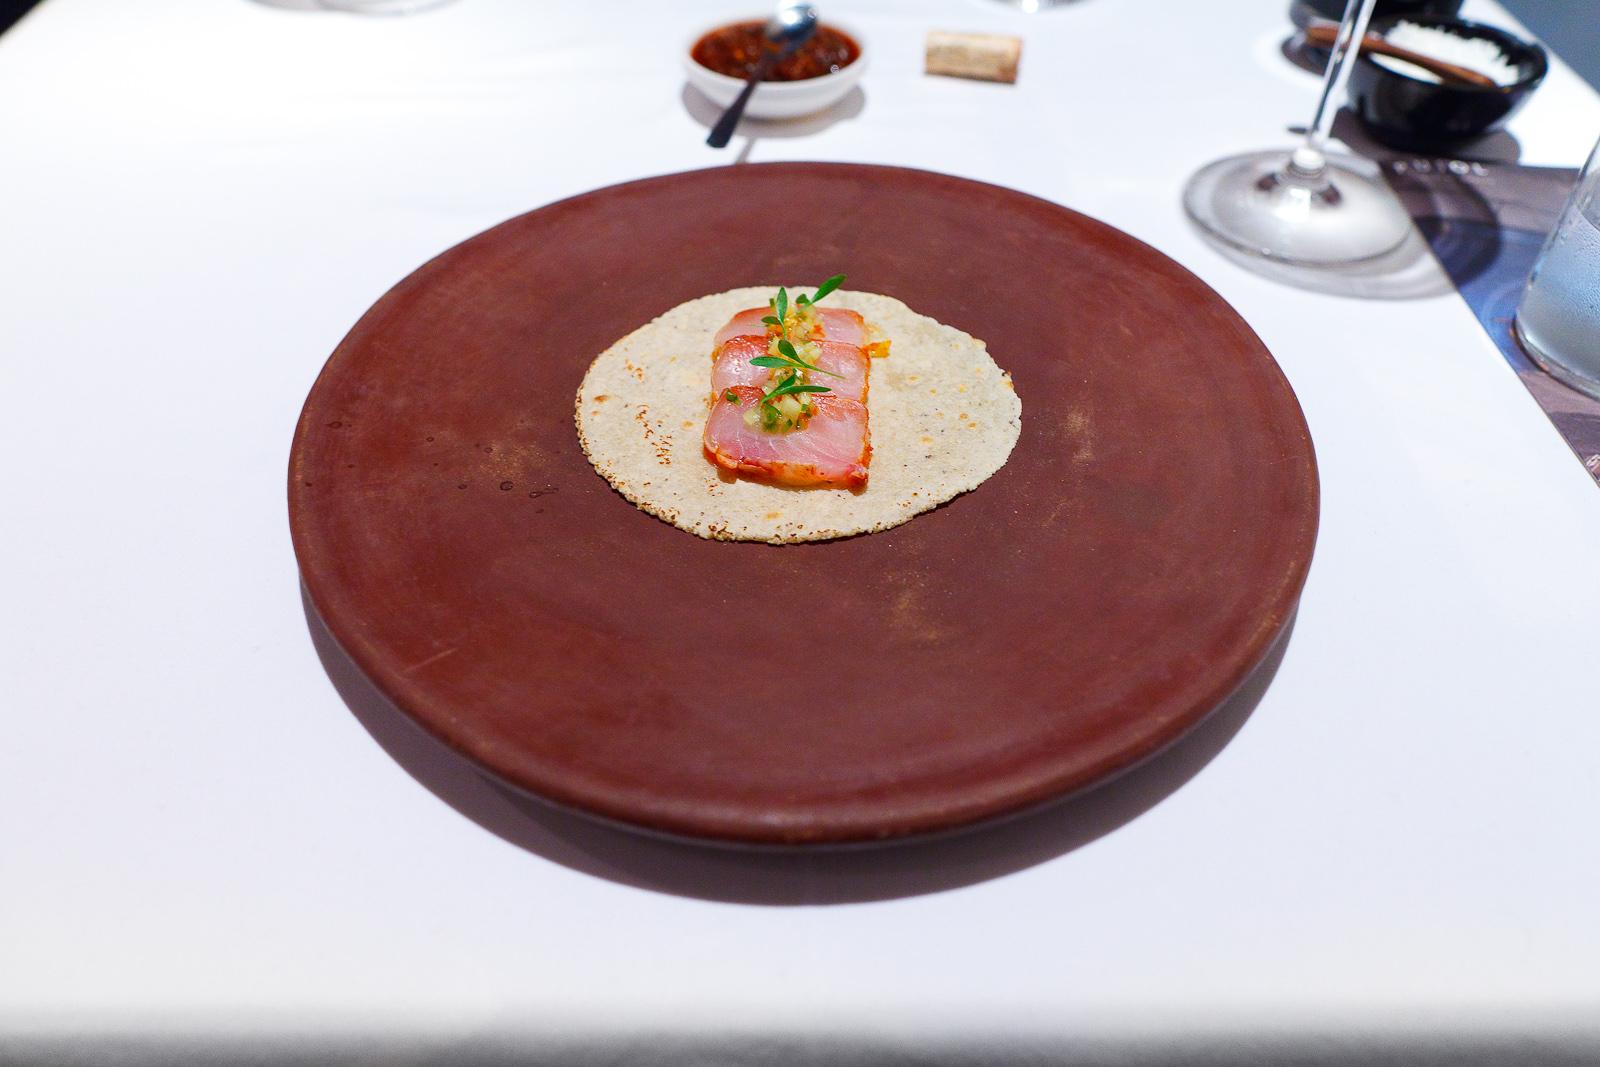 4th Course: Taco de tataki de robalo al pastor, piña (Taco al pastor with snook, pineapple mayonaise)